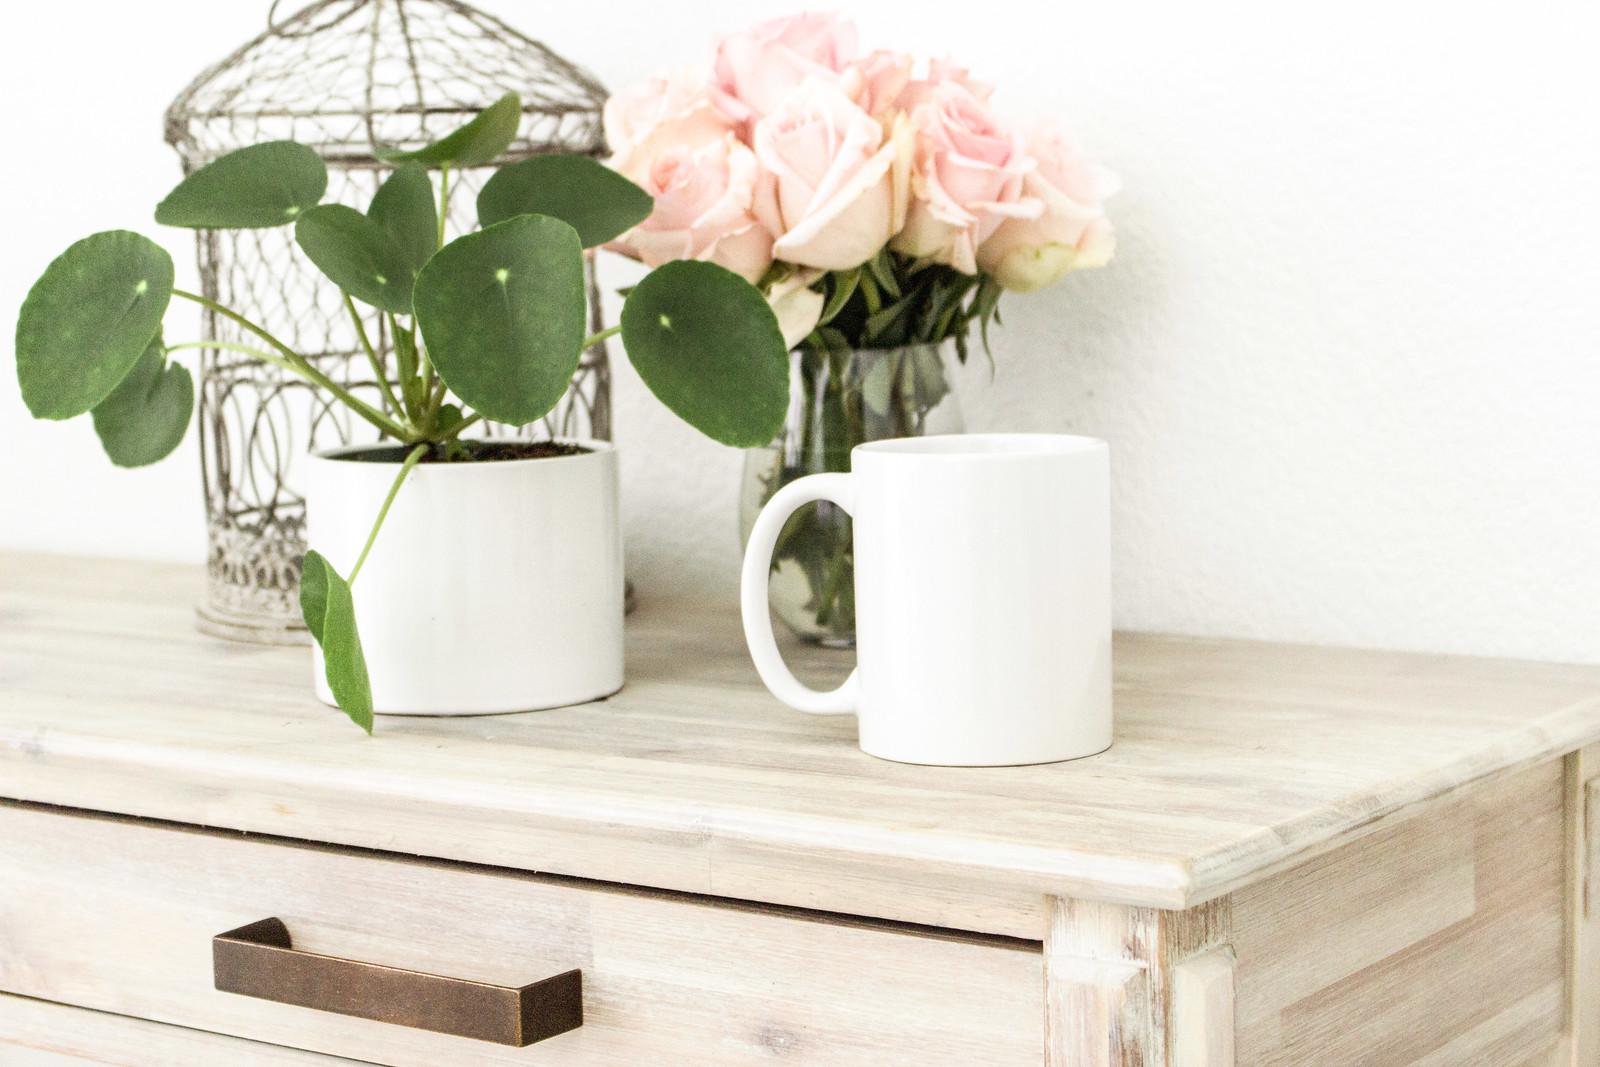 plant mug flowers dresser